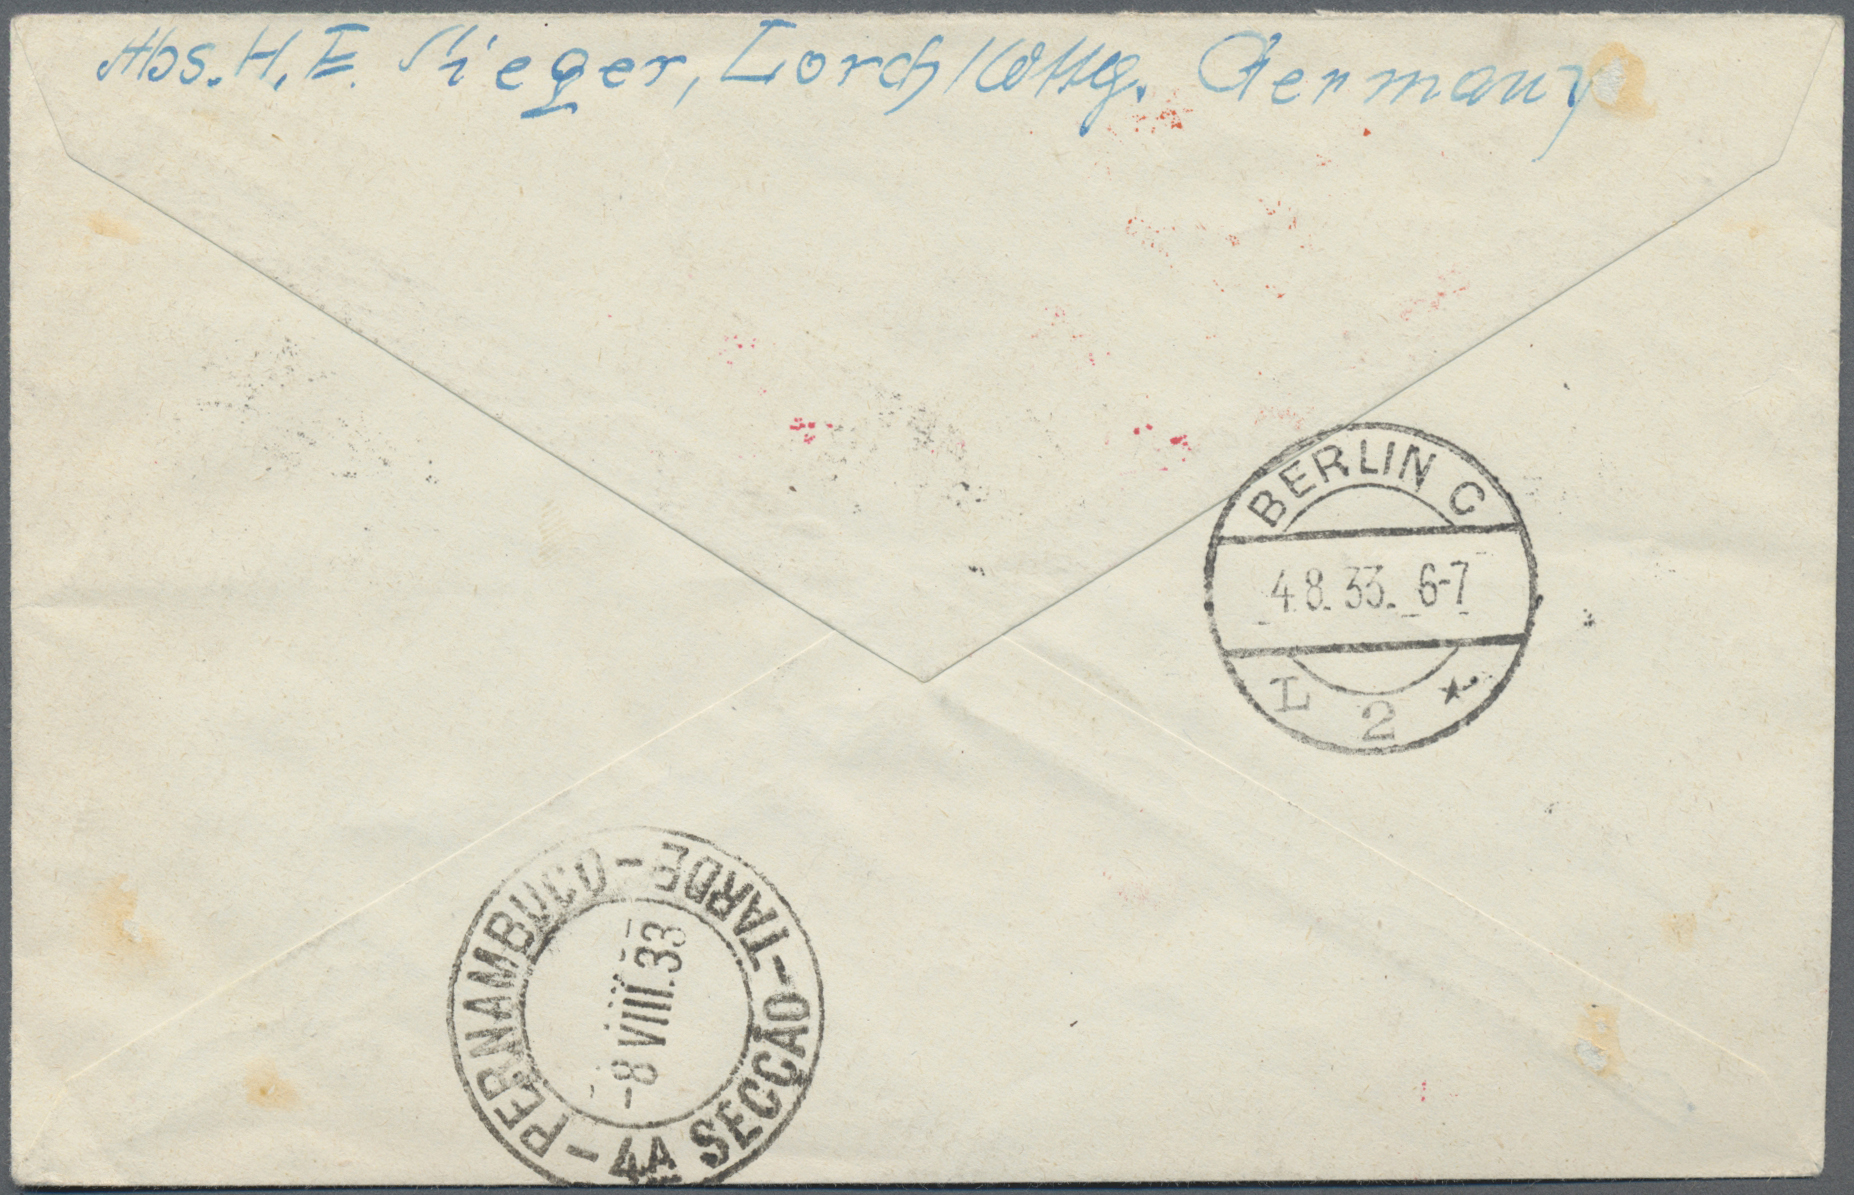 Lot 13528 - zeppelinpost deutschland  -  Auktionshaus Christoph Gärtner GmbH & Co. KG Sale #43 Asia, Overseas, Air & Ships, Mail, Spain, Day 4